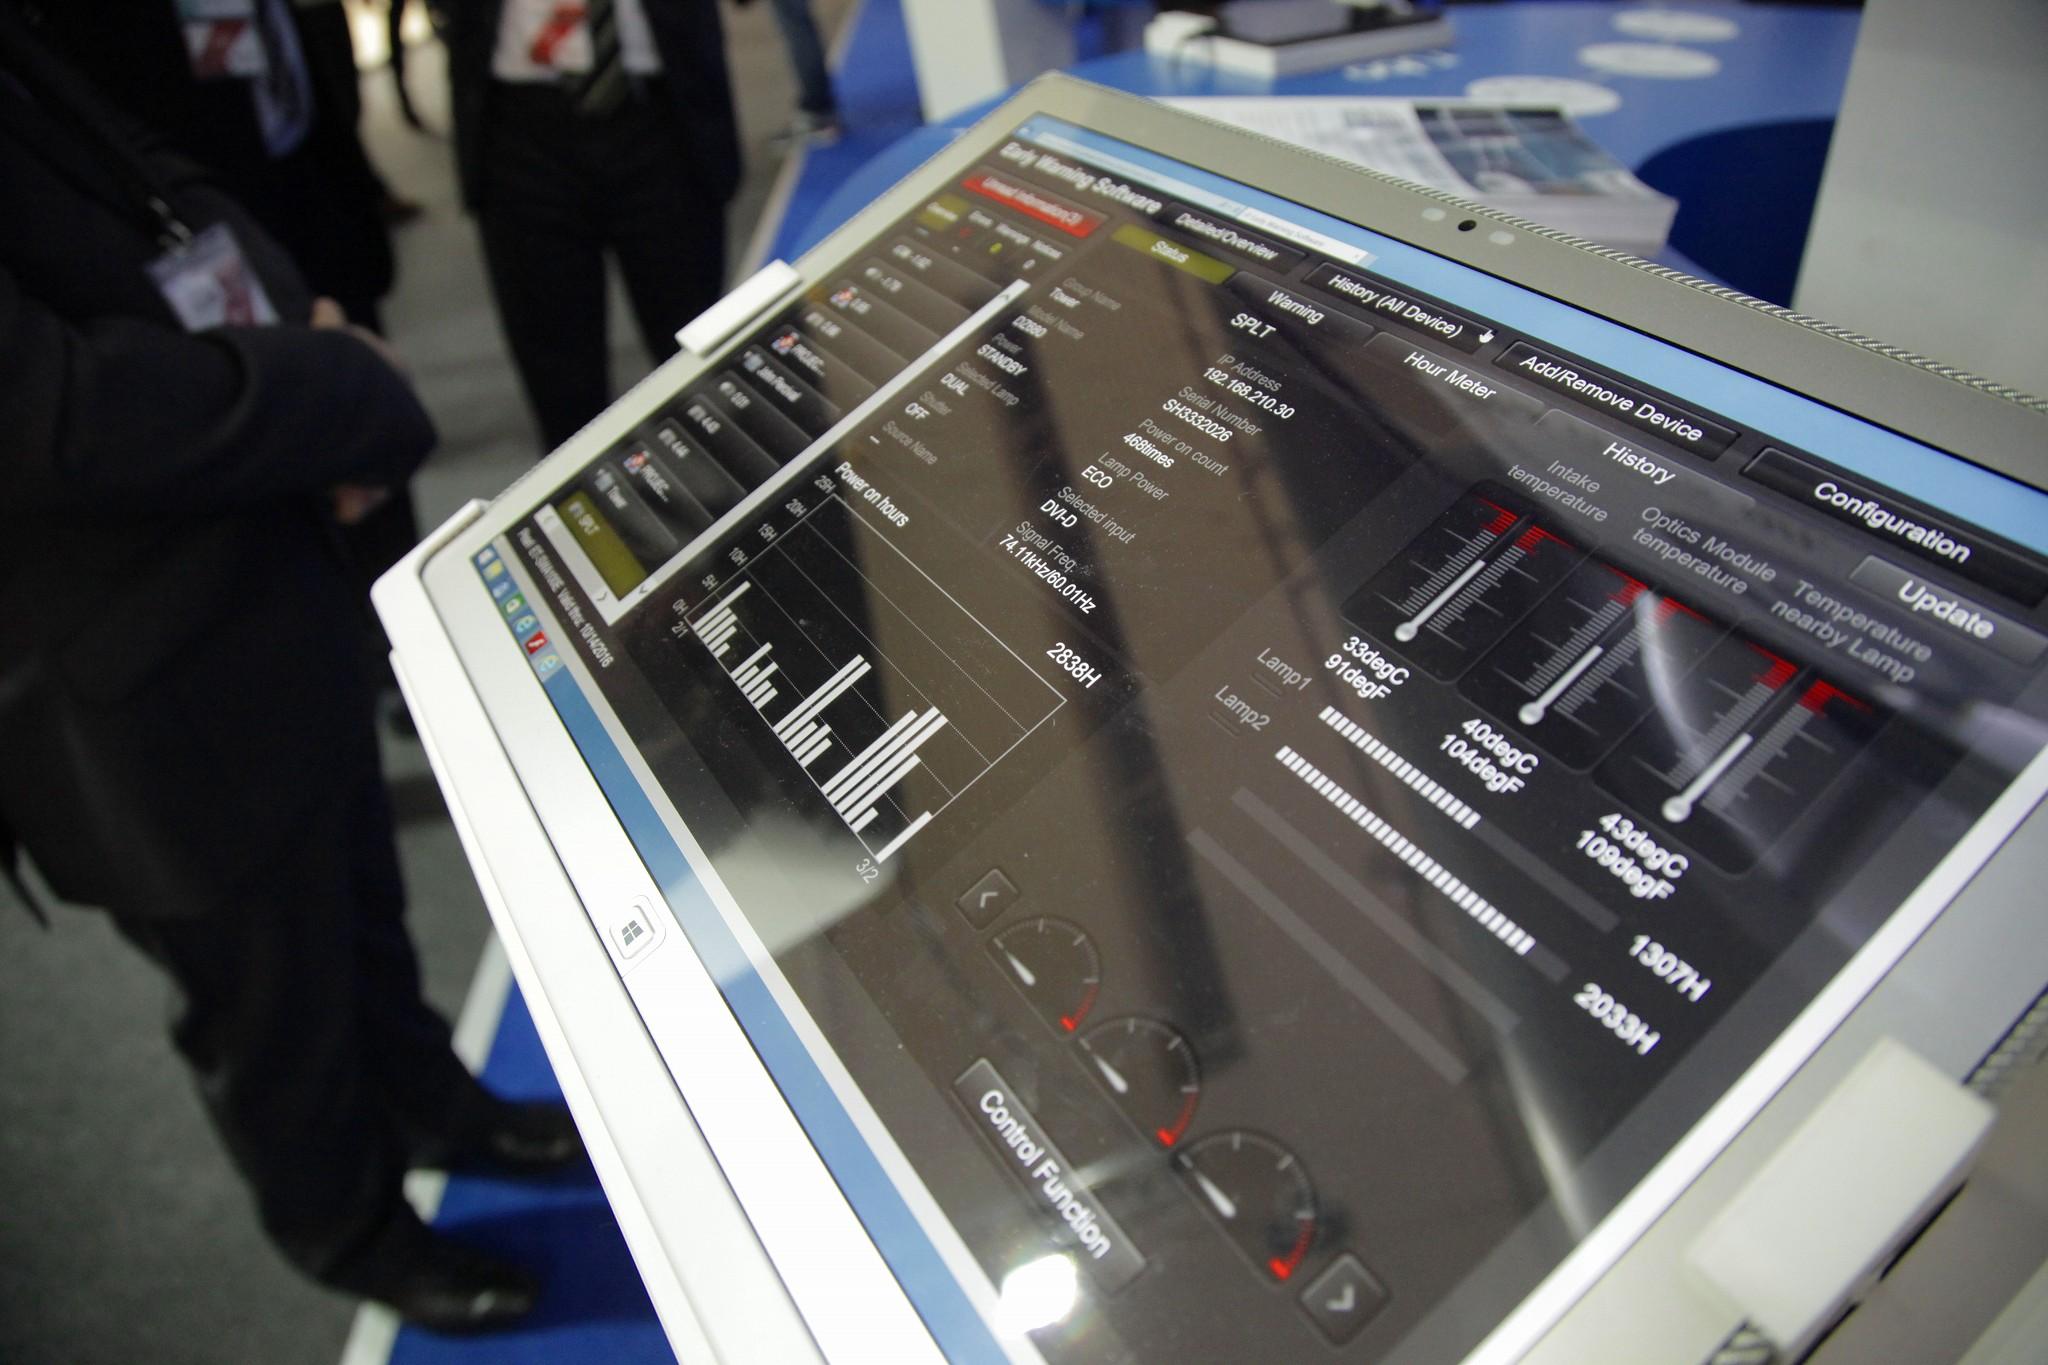 M2Mクラウドに接続されたプロジェクターなど機器の状態を遠隔で監視・管理することができる